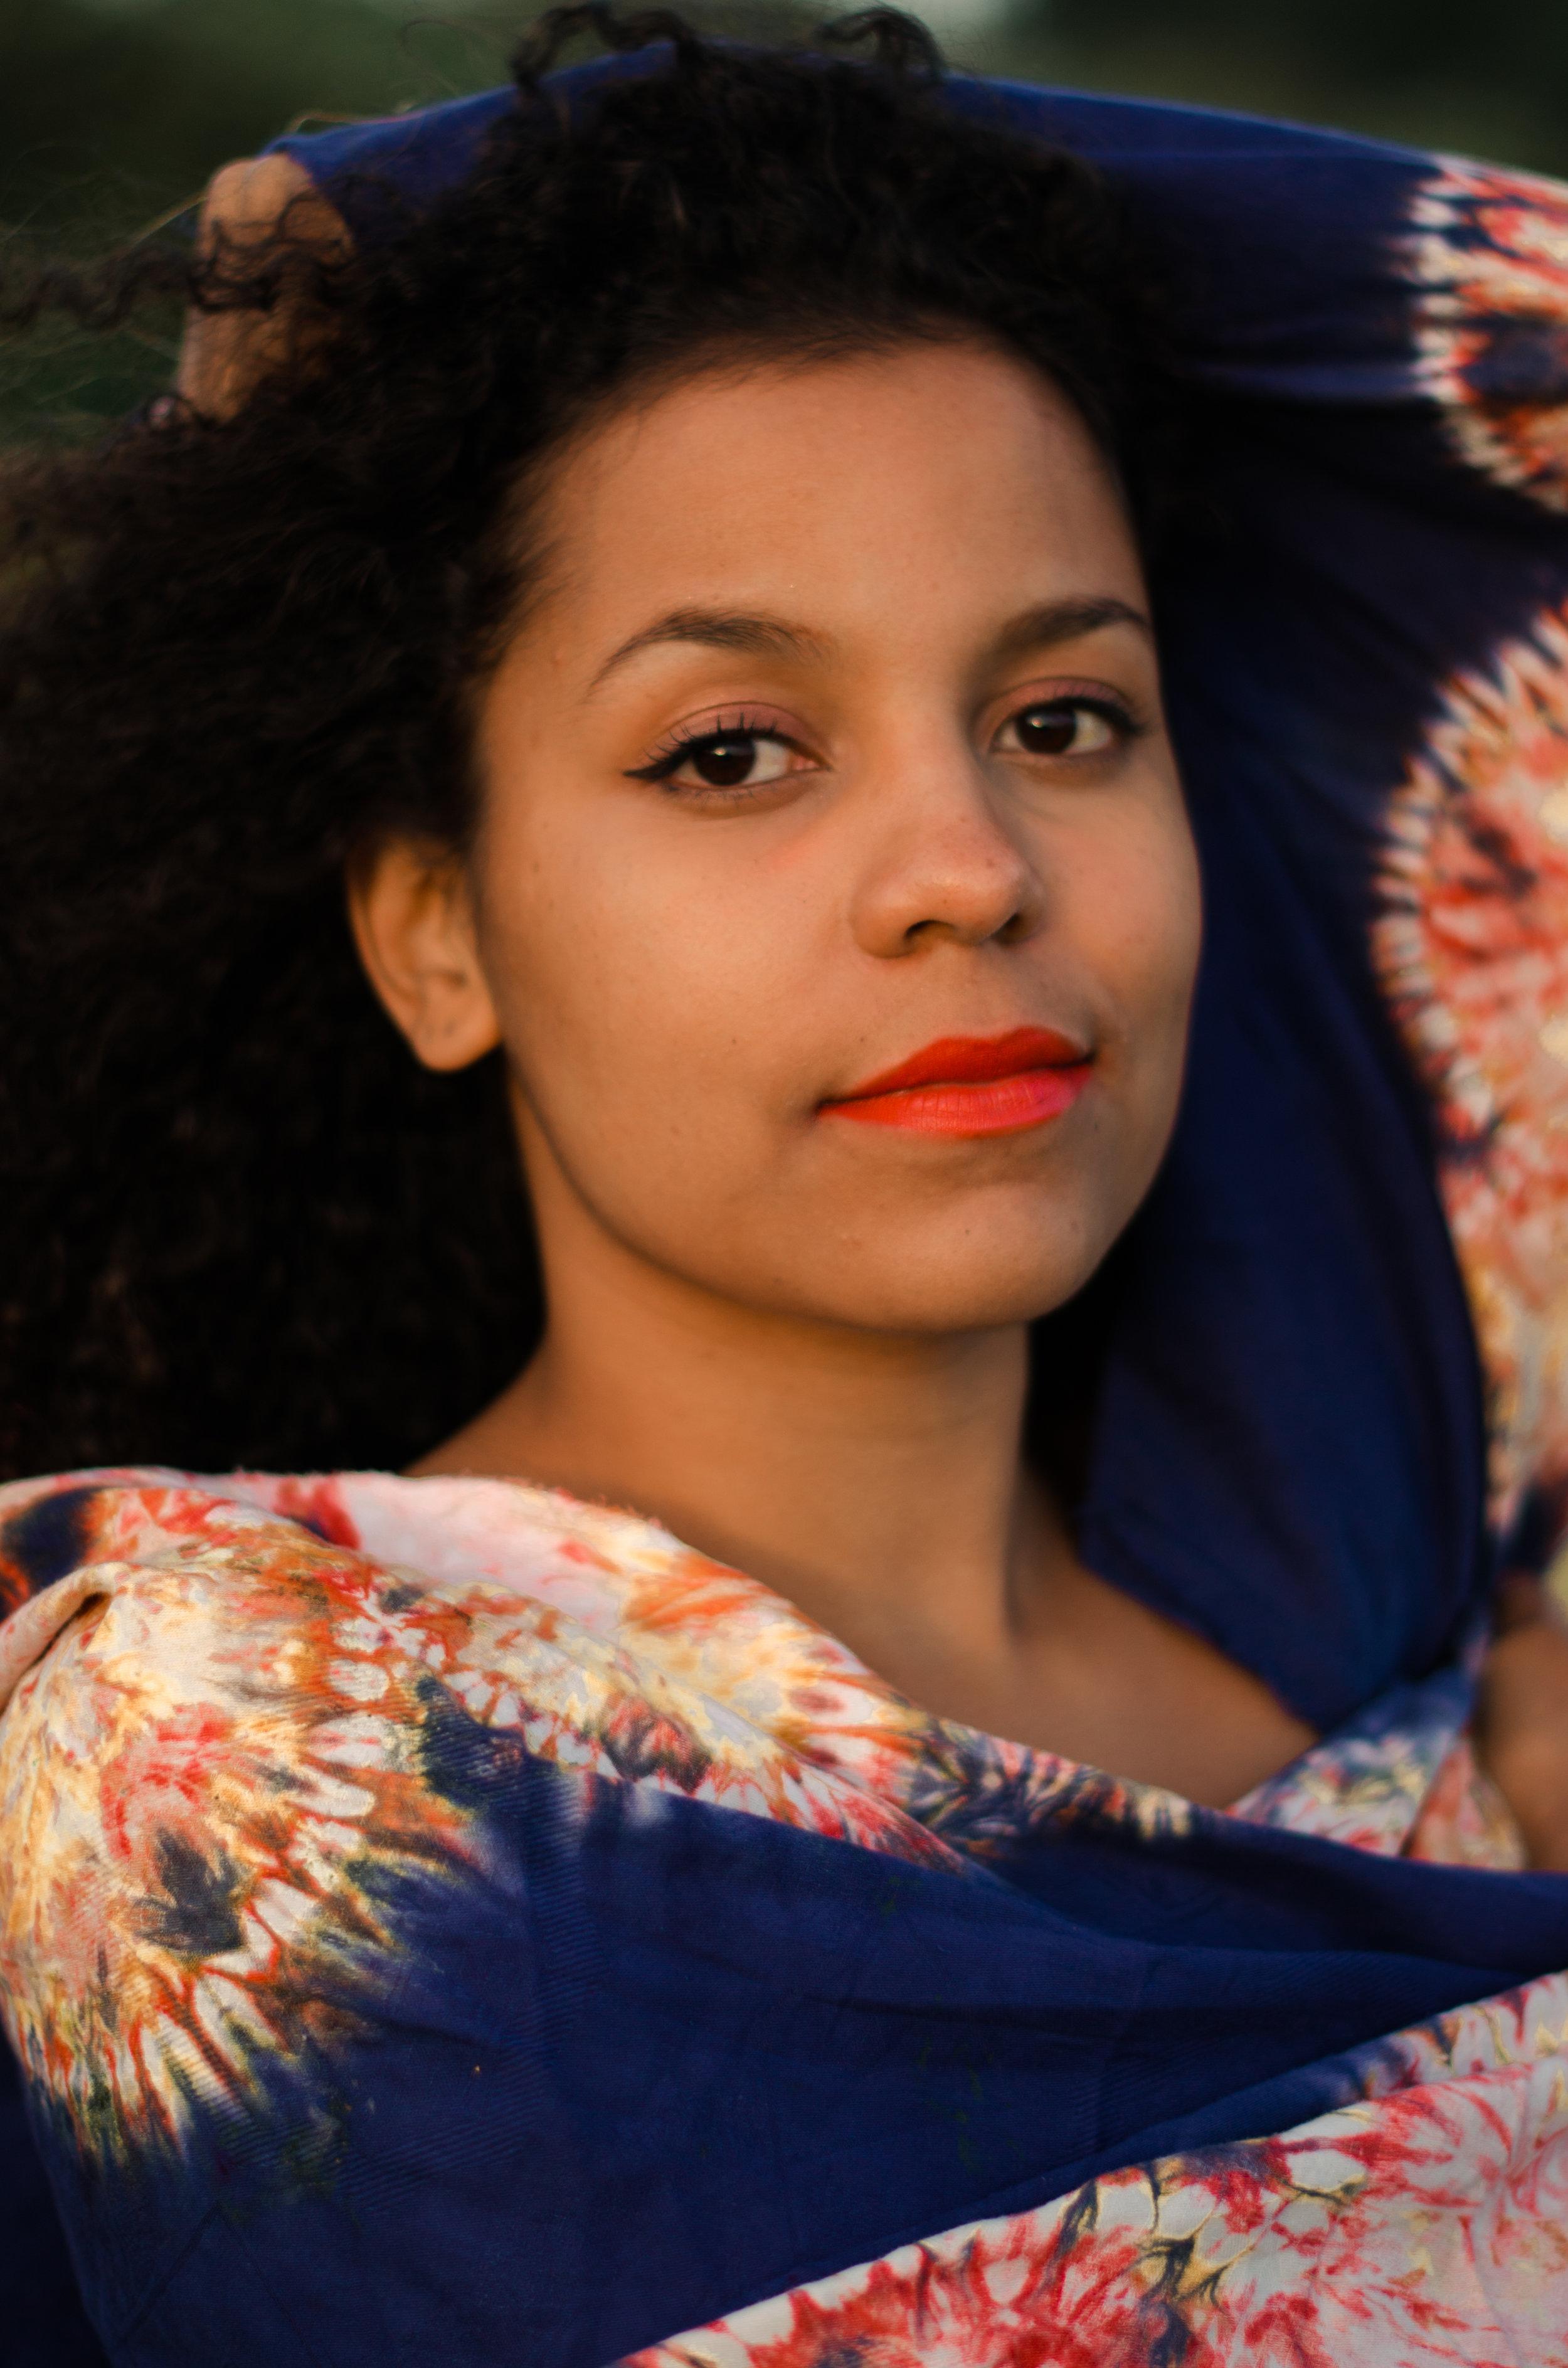 Inka-Portrait-Session-Aiste-Saulyte-Photography-17-07-30-459.jpg